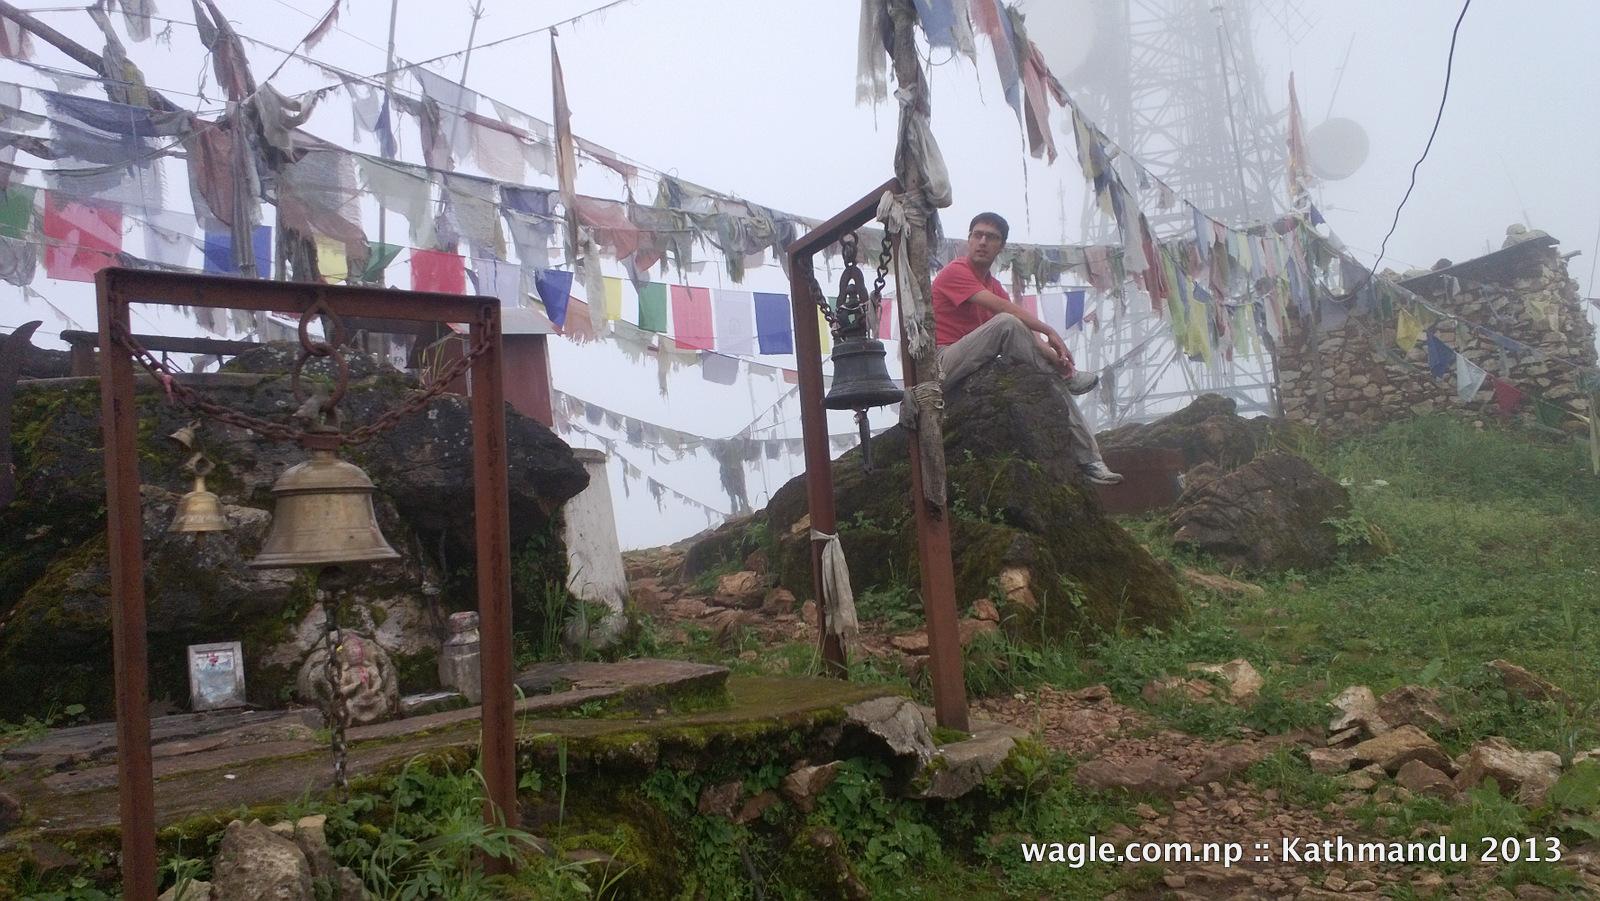 Dinesh Wagle at Phulchowki. Bells, prayer flags and trishuls